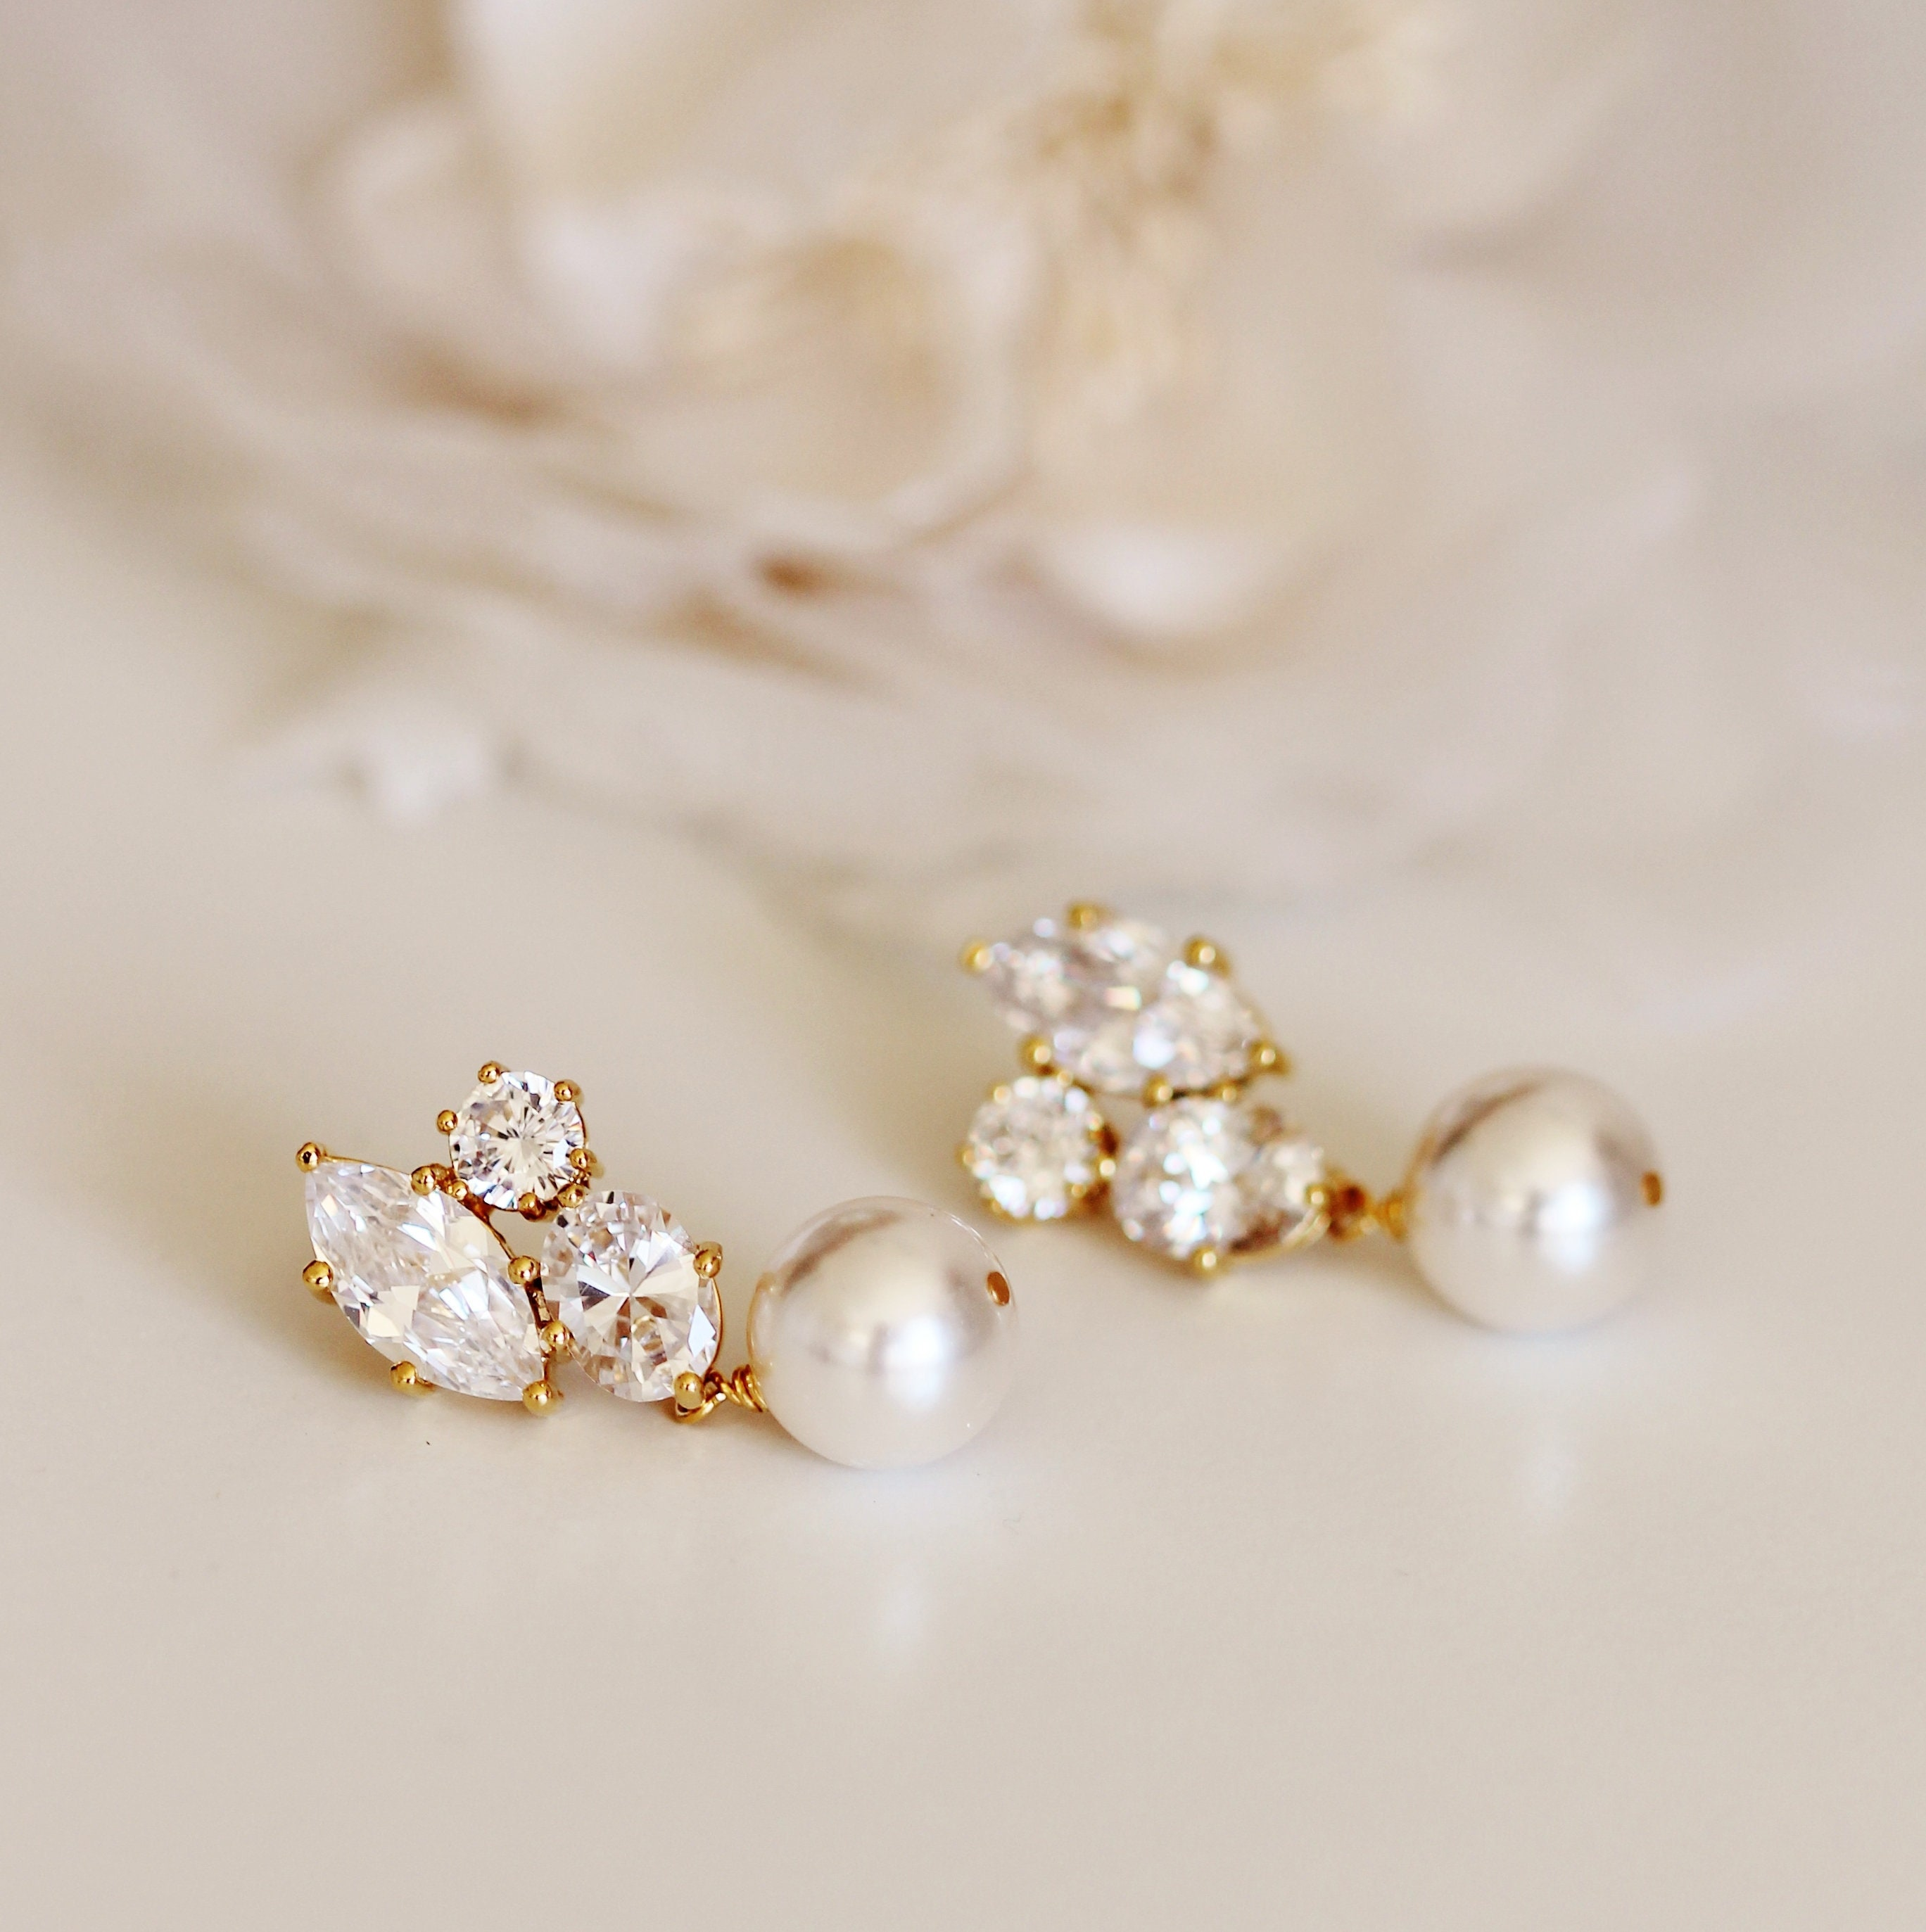 4a6684d6458da Gold Bridal Earrings, Rose Gold White Ivory Swarovski Pearl Earrings,  Bridesmaid Earrings, Gold Wedding Jewelry, Mother Gift E101